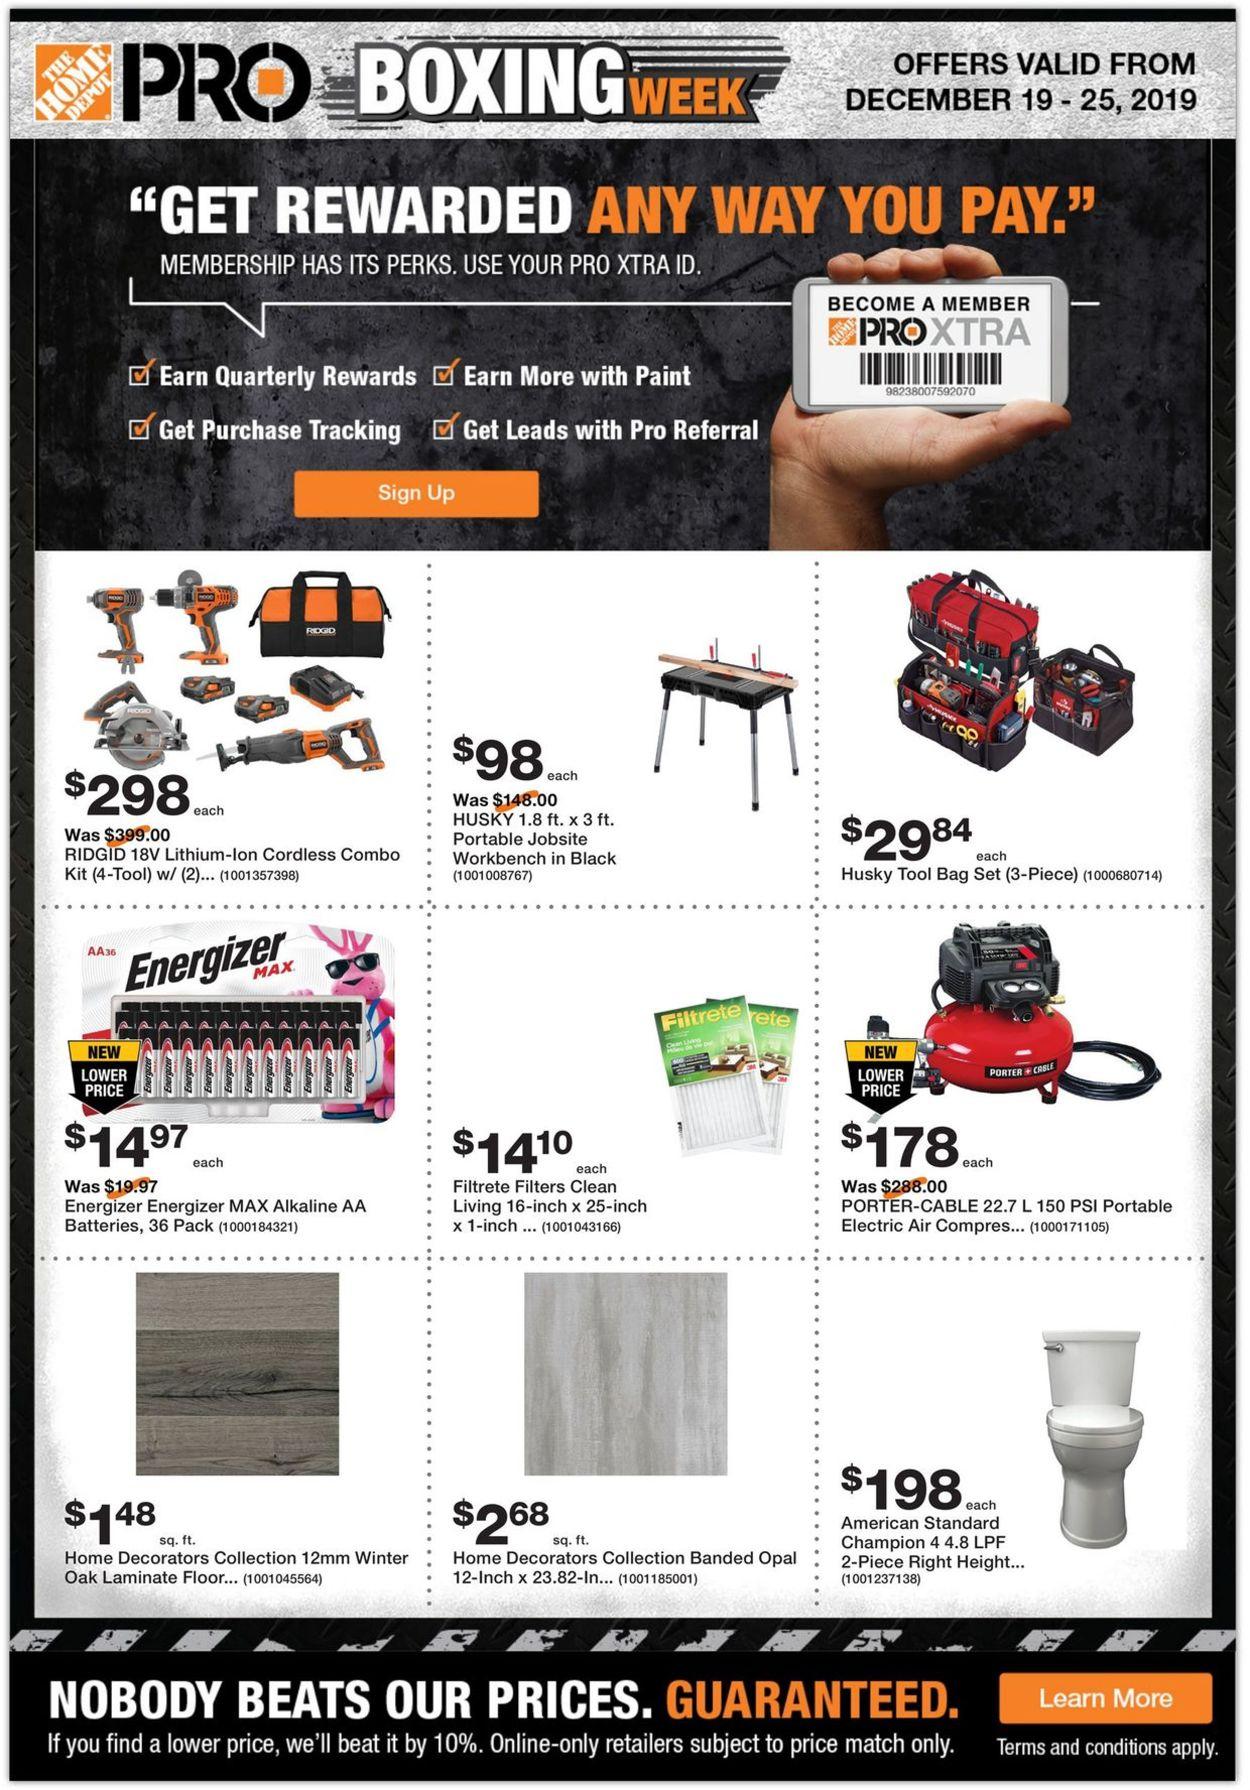 Home Depot - PRE BOXING WEEK SALE